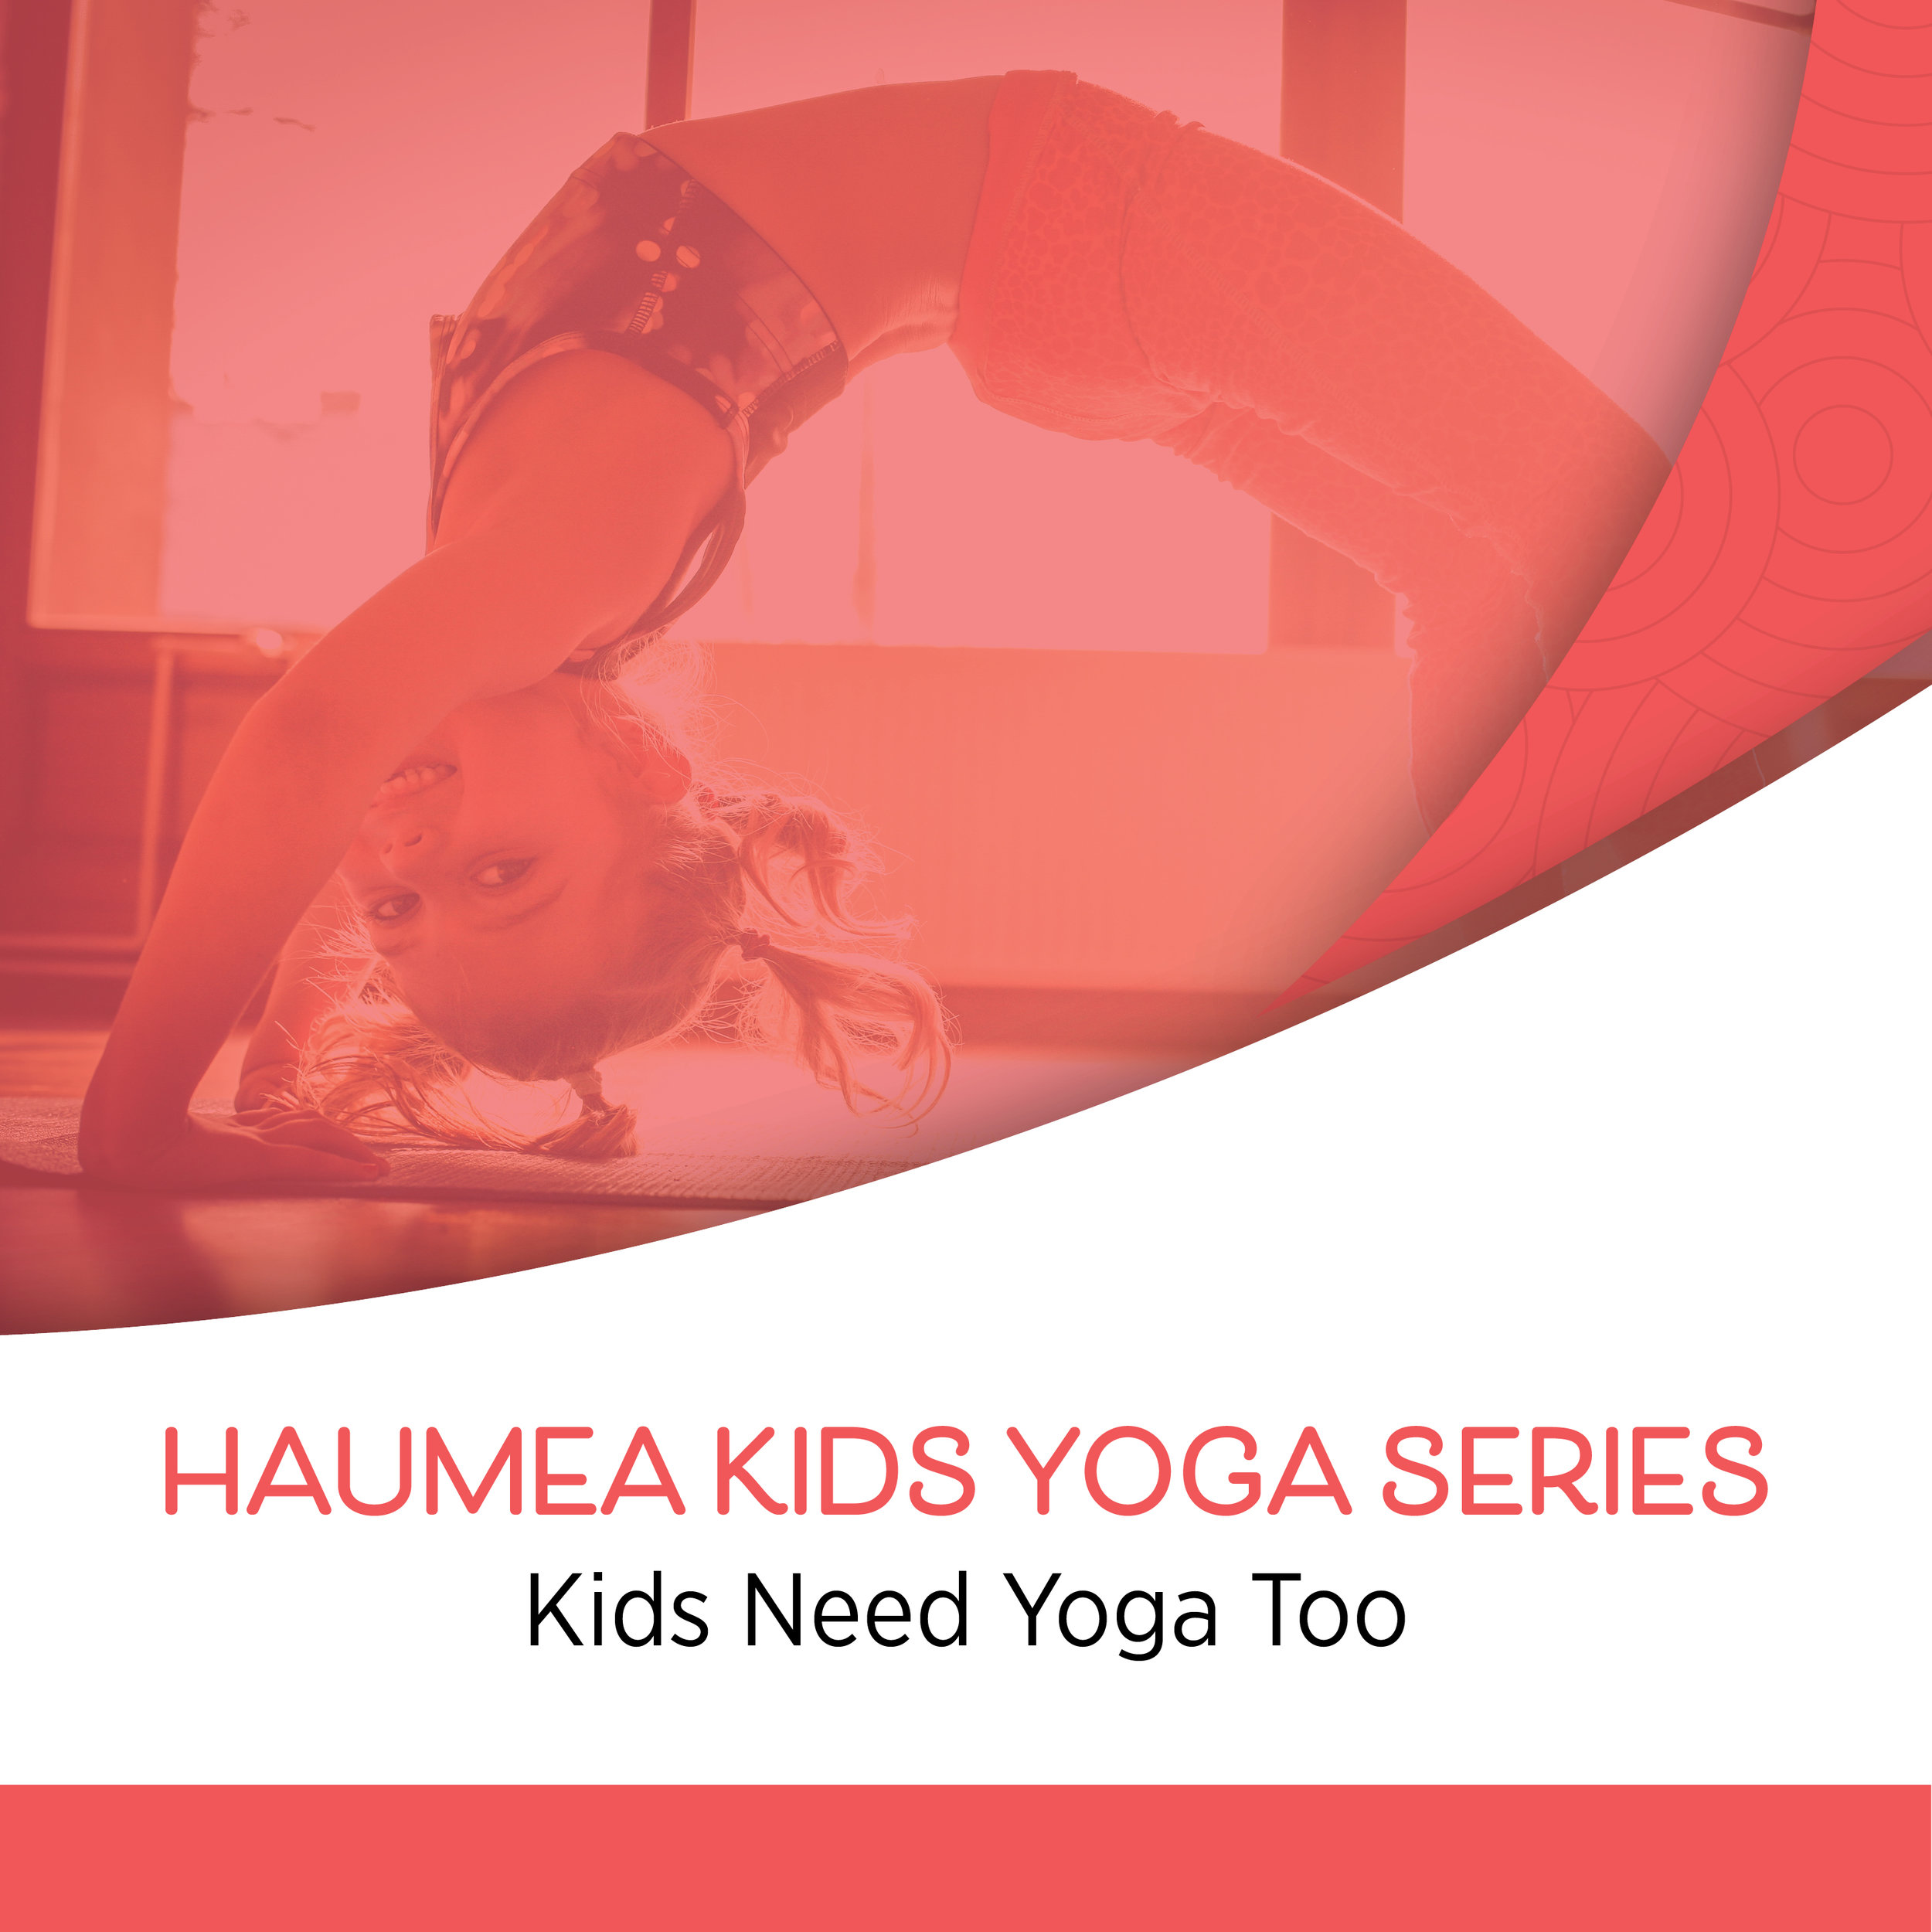 Haumea Kids Yoga Series - With Georgia LyonSaturdays, Nov. 2 - Dec. 149:30 AM - 10:30 AM$65